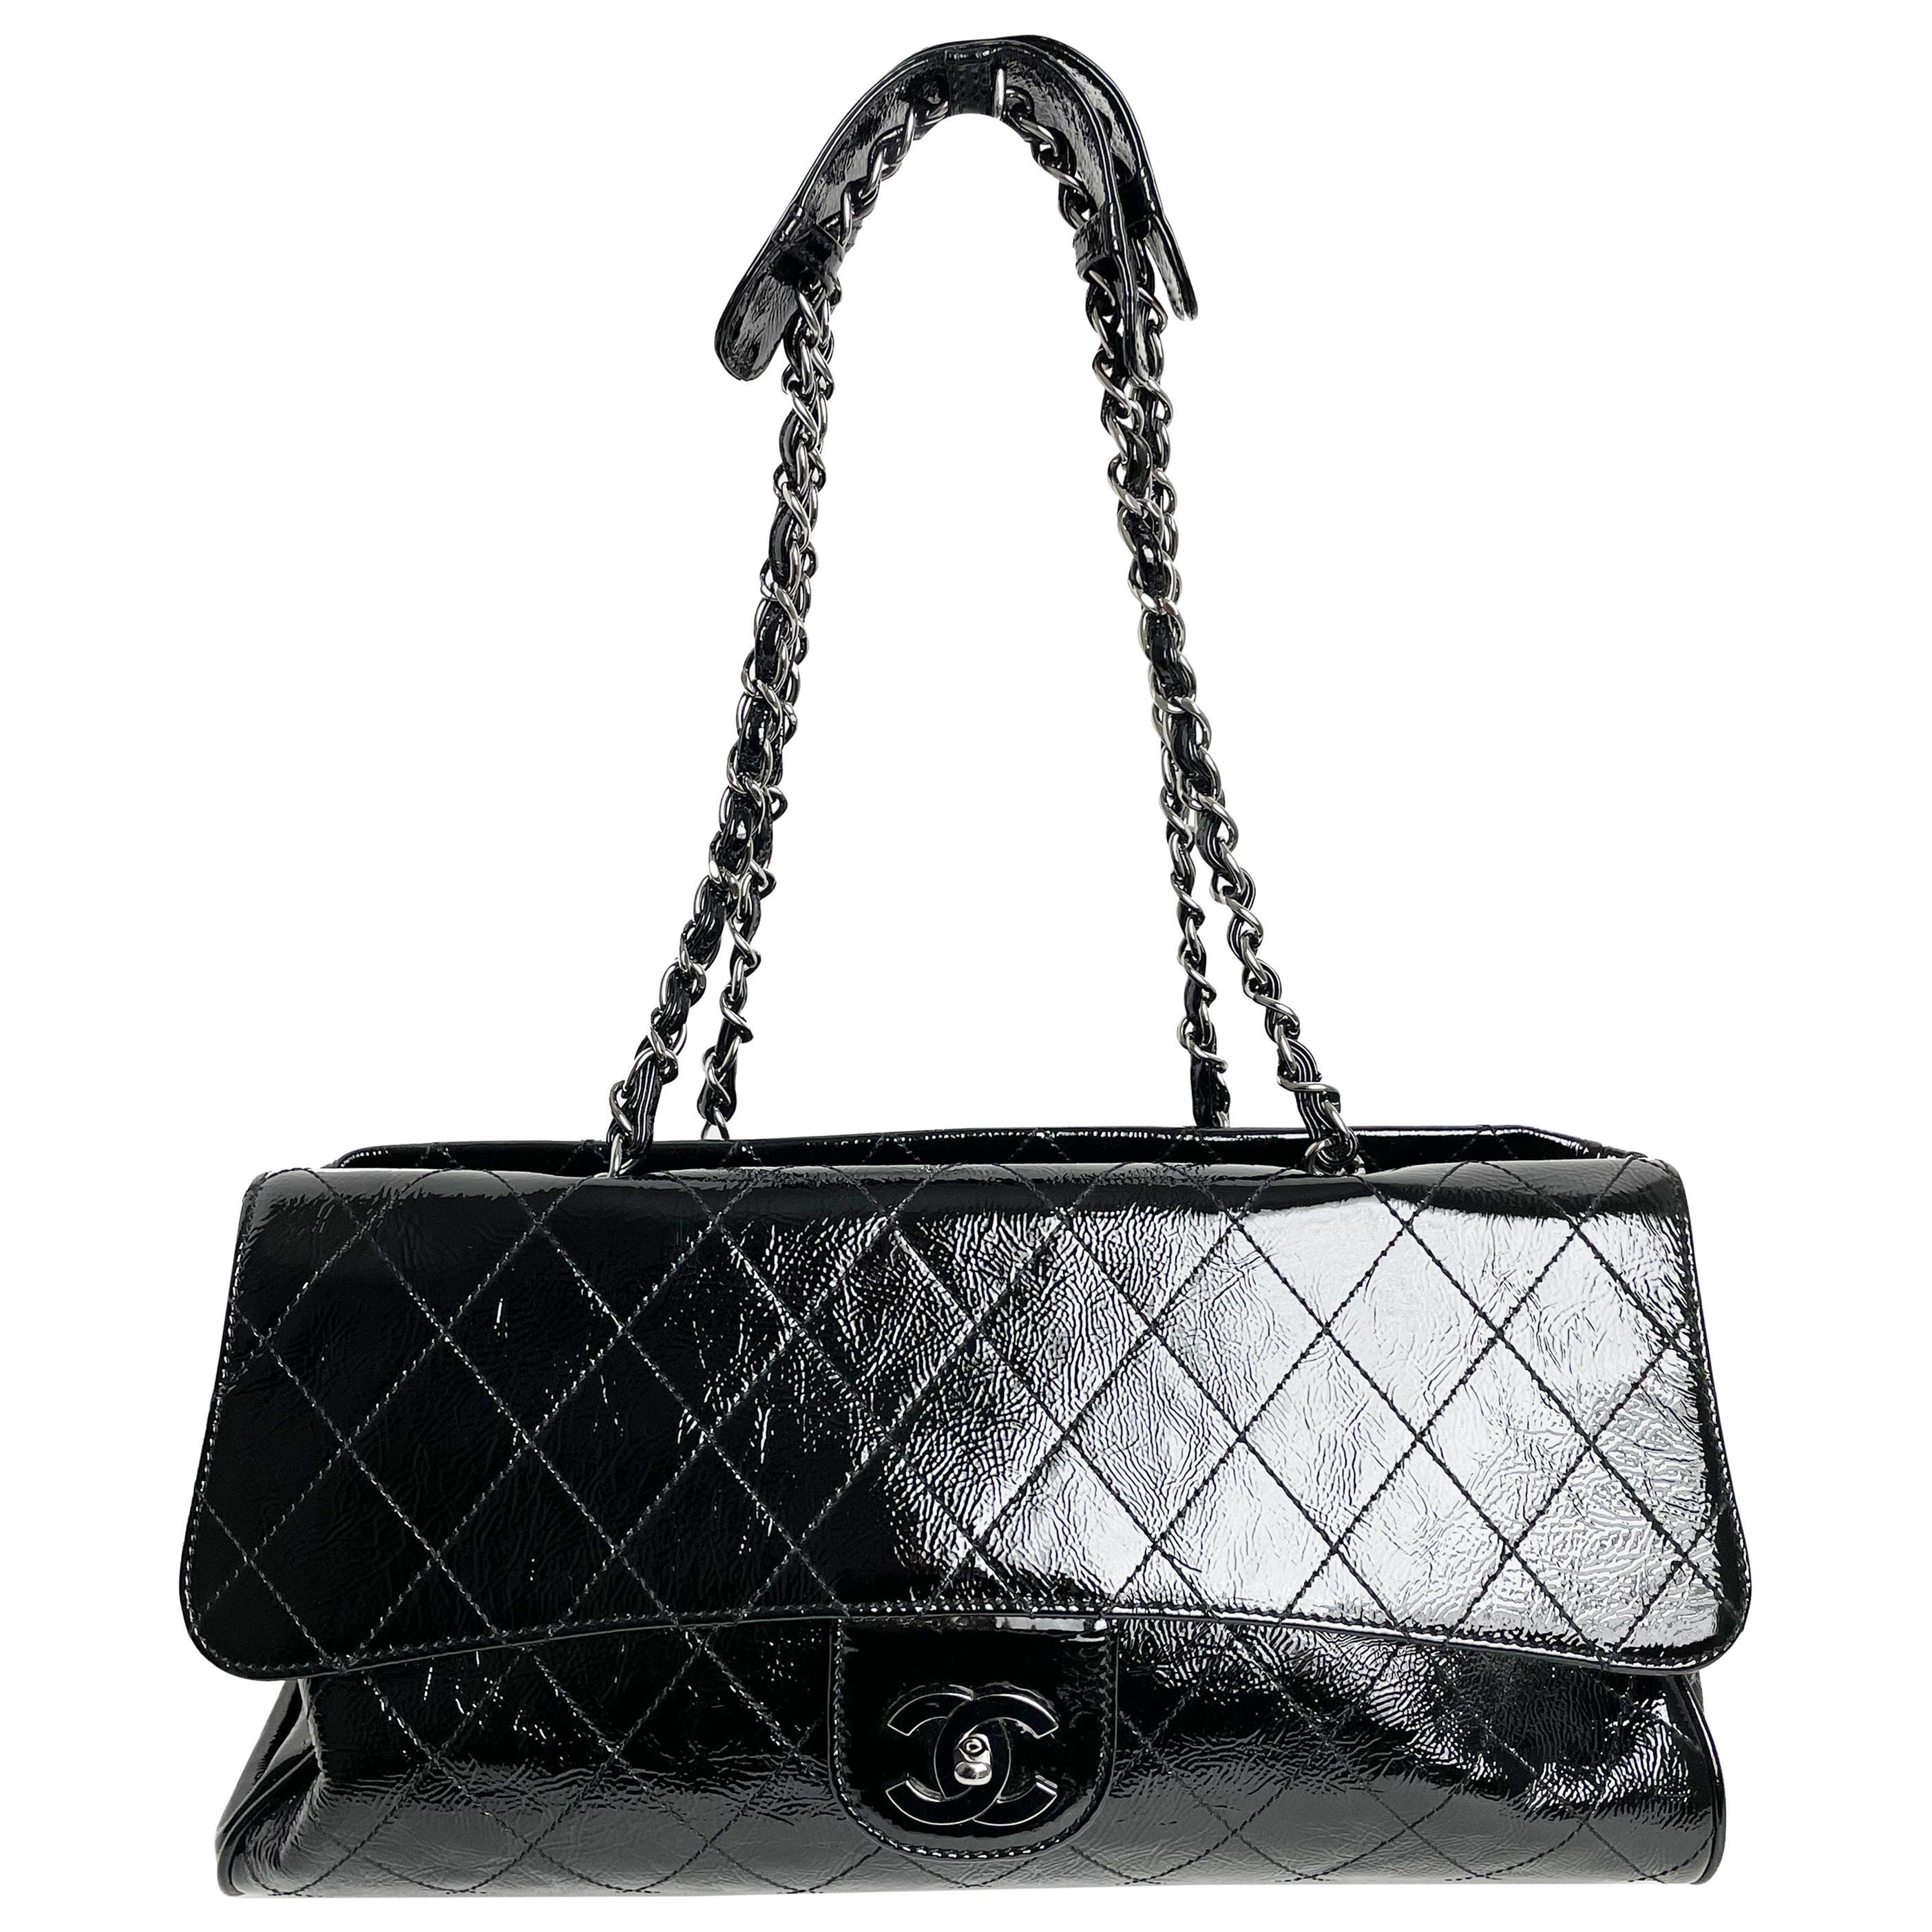 Chanel Ritz Shoulder Bag Convertible Clutch Black Matelasse Patent Leather